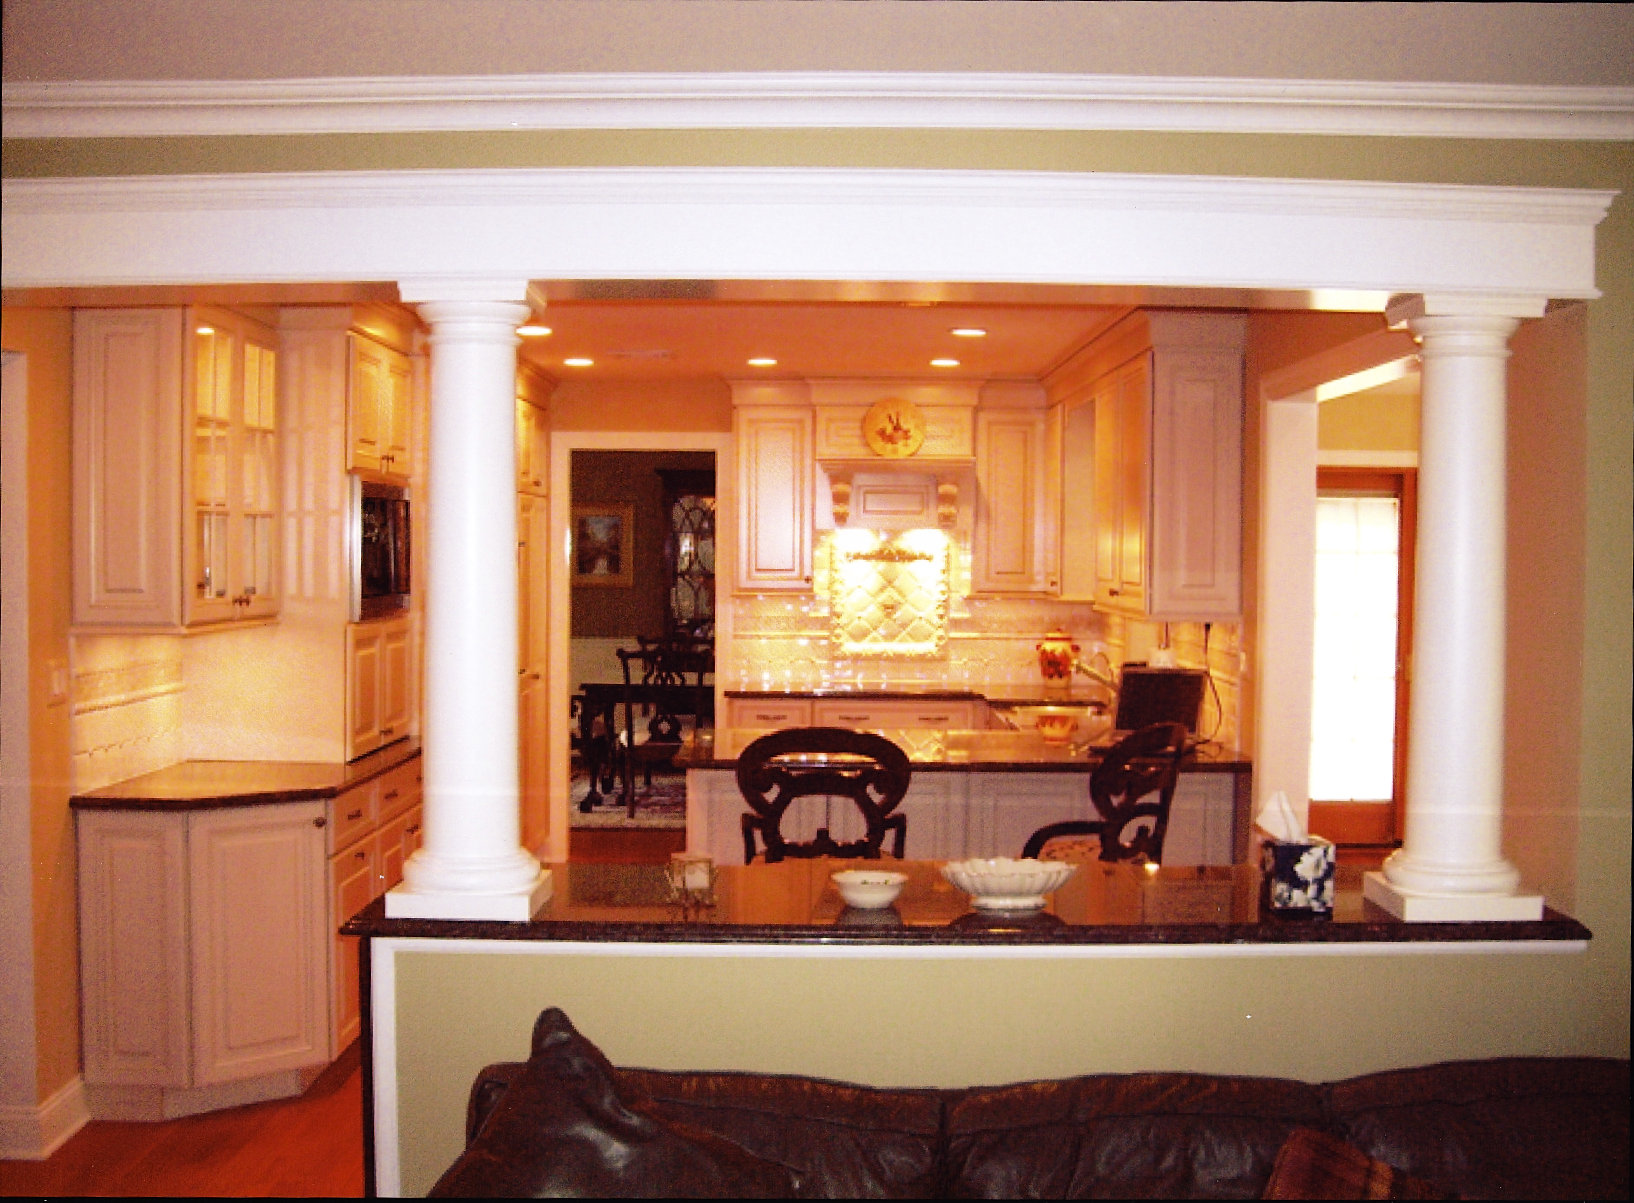 Kitchen Family Room Home Improvement Contractors Joe Shadel General Contracting